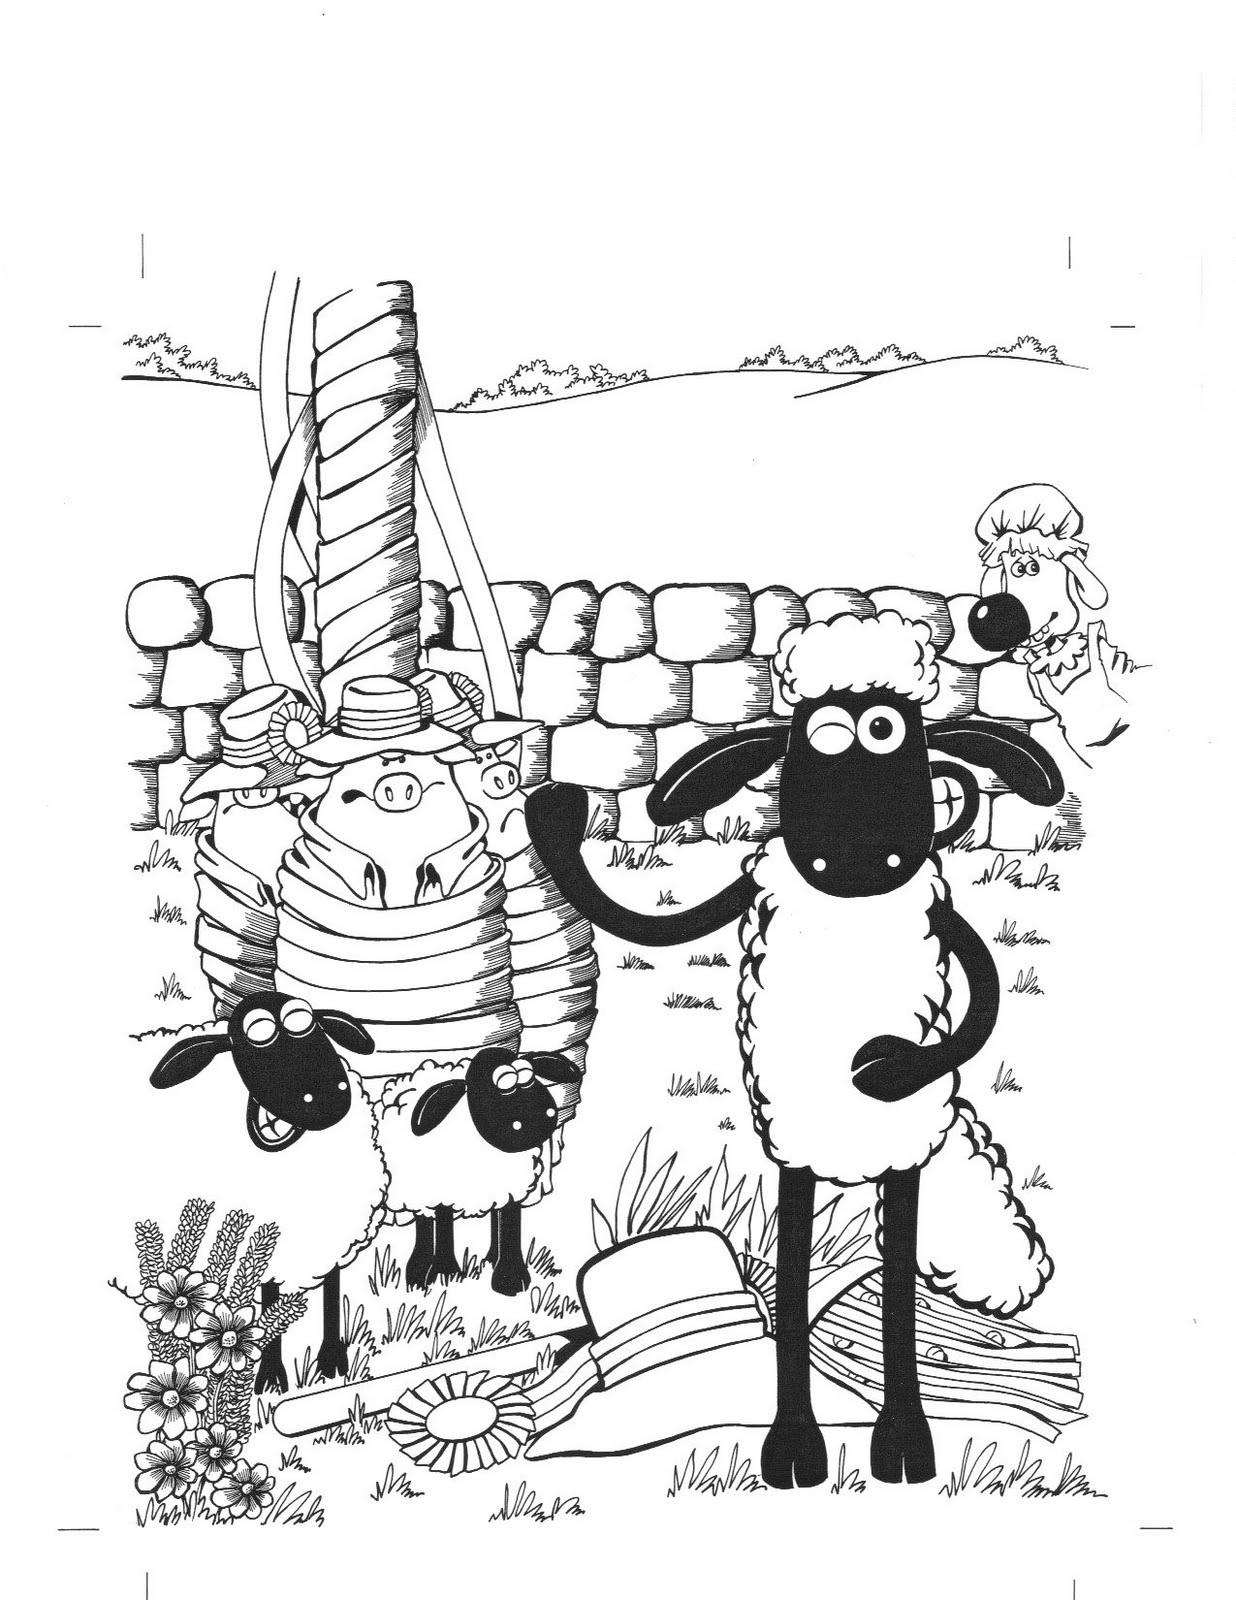 Mychailo Kazybrid's Character Creation: Shaun the Sheep